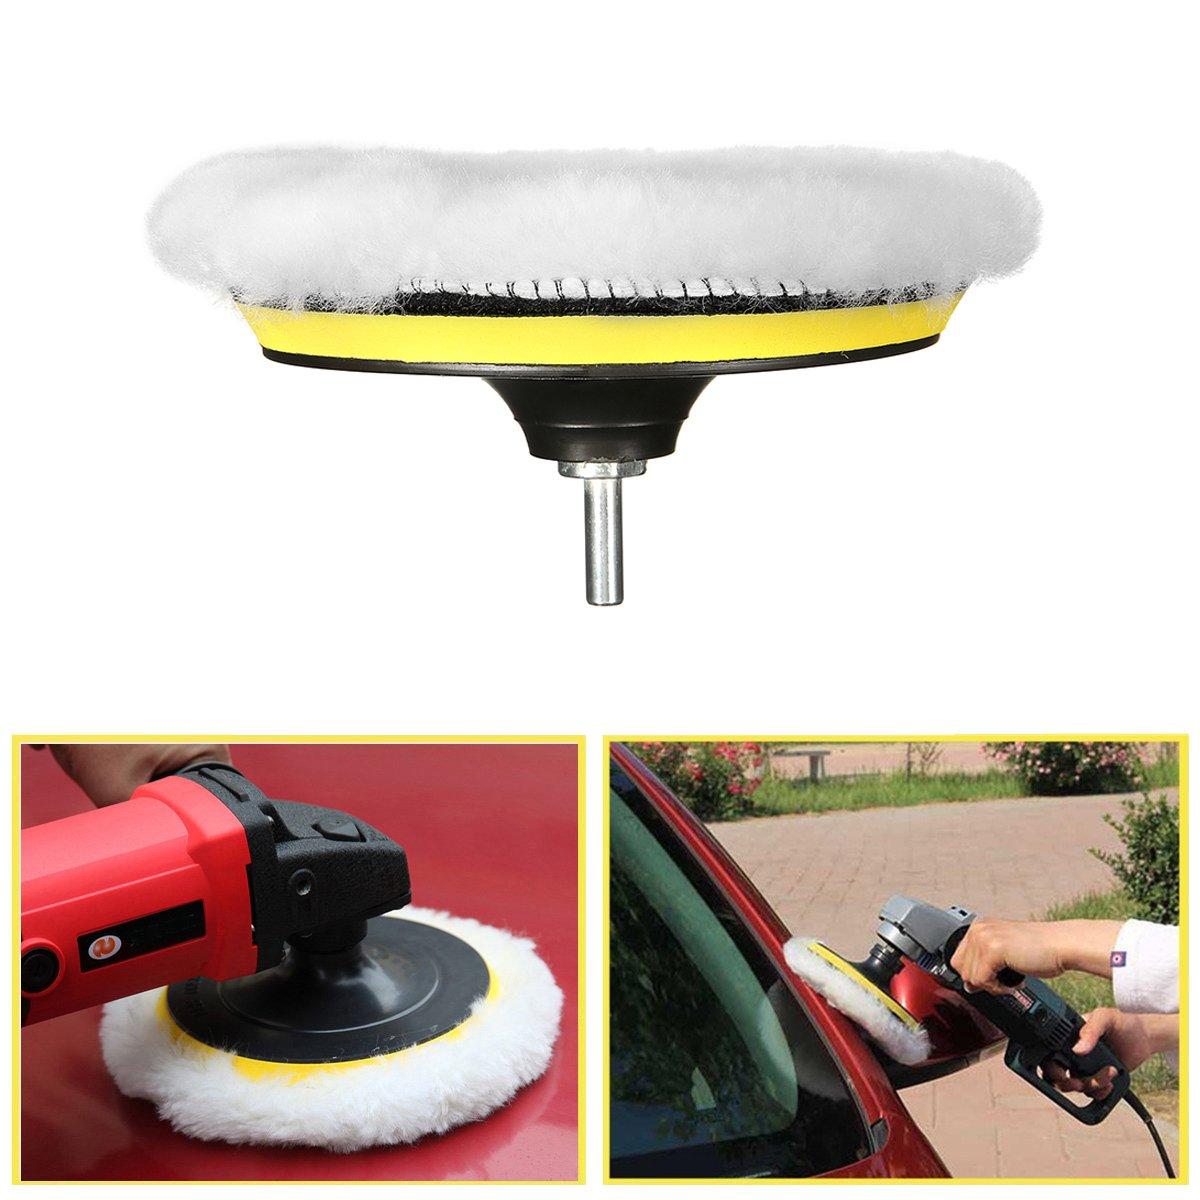 MATCC 7Pcs 6inch Polishing pads,Sponge and Woolen Polishing Waxing Buffing Pads Kits with M14 Drill Adapter, 6inchs by MATCC (Image #6)